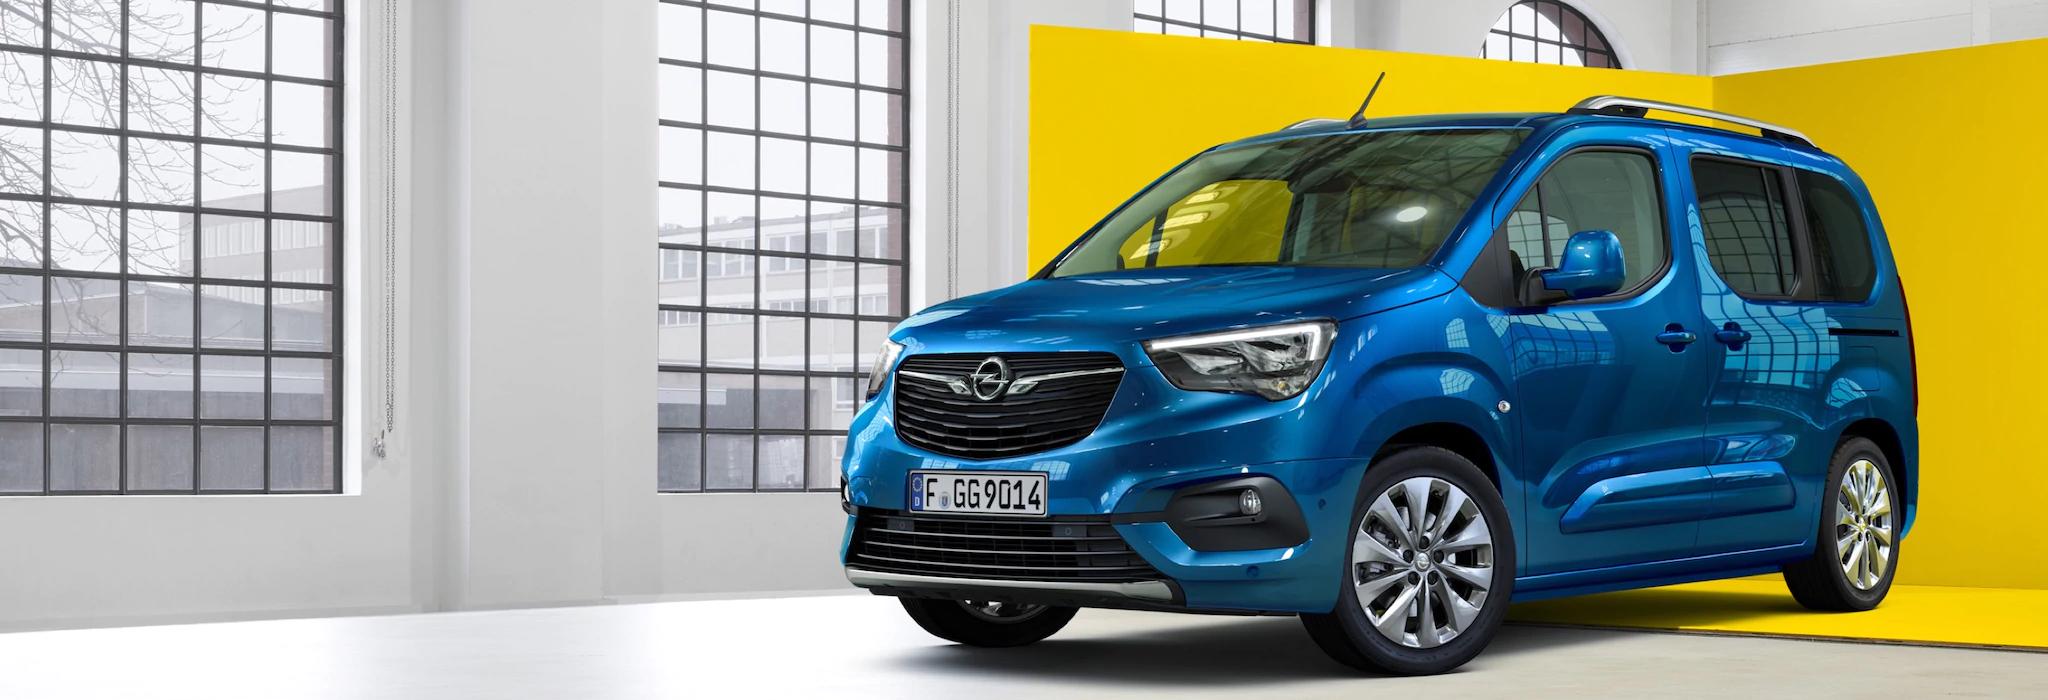 Opel Combo Life Exterior 21x9 Cml18 E01 001